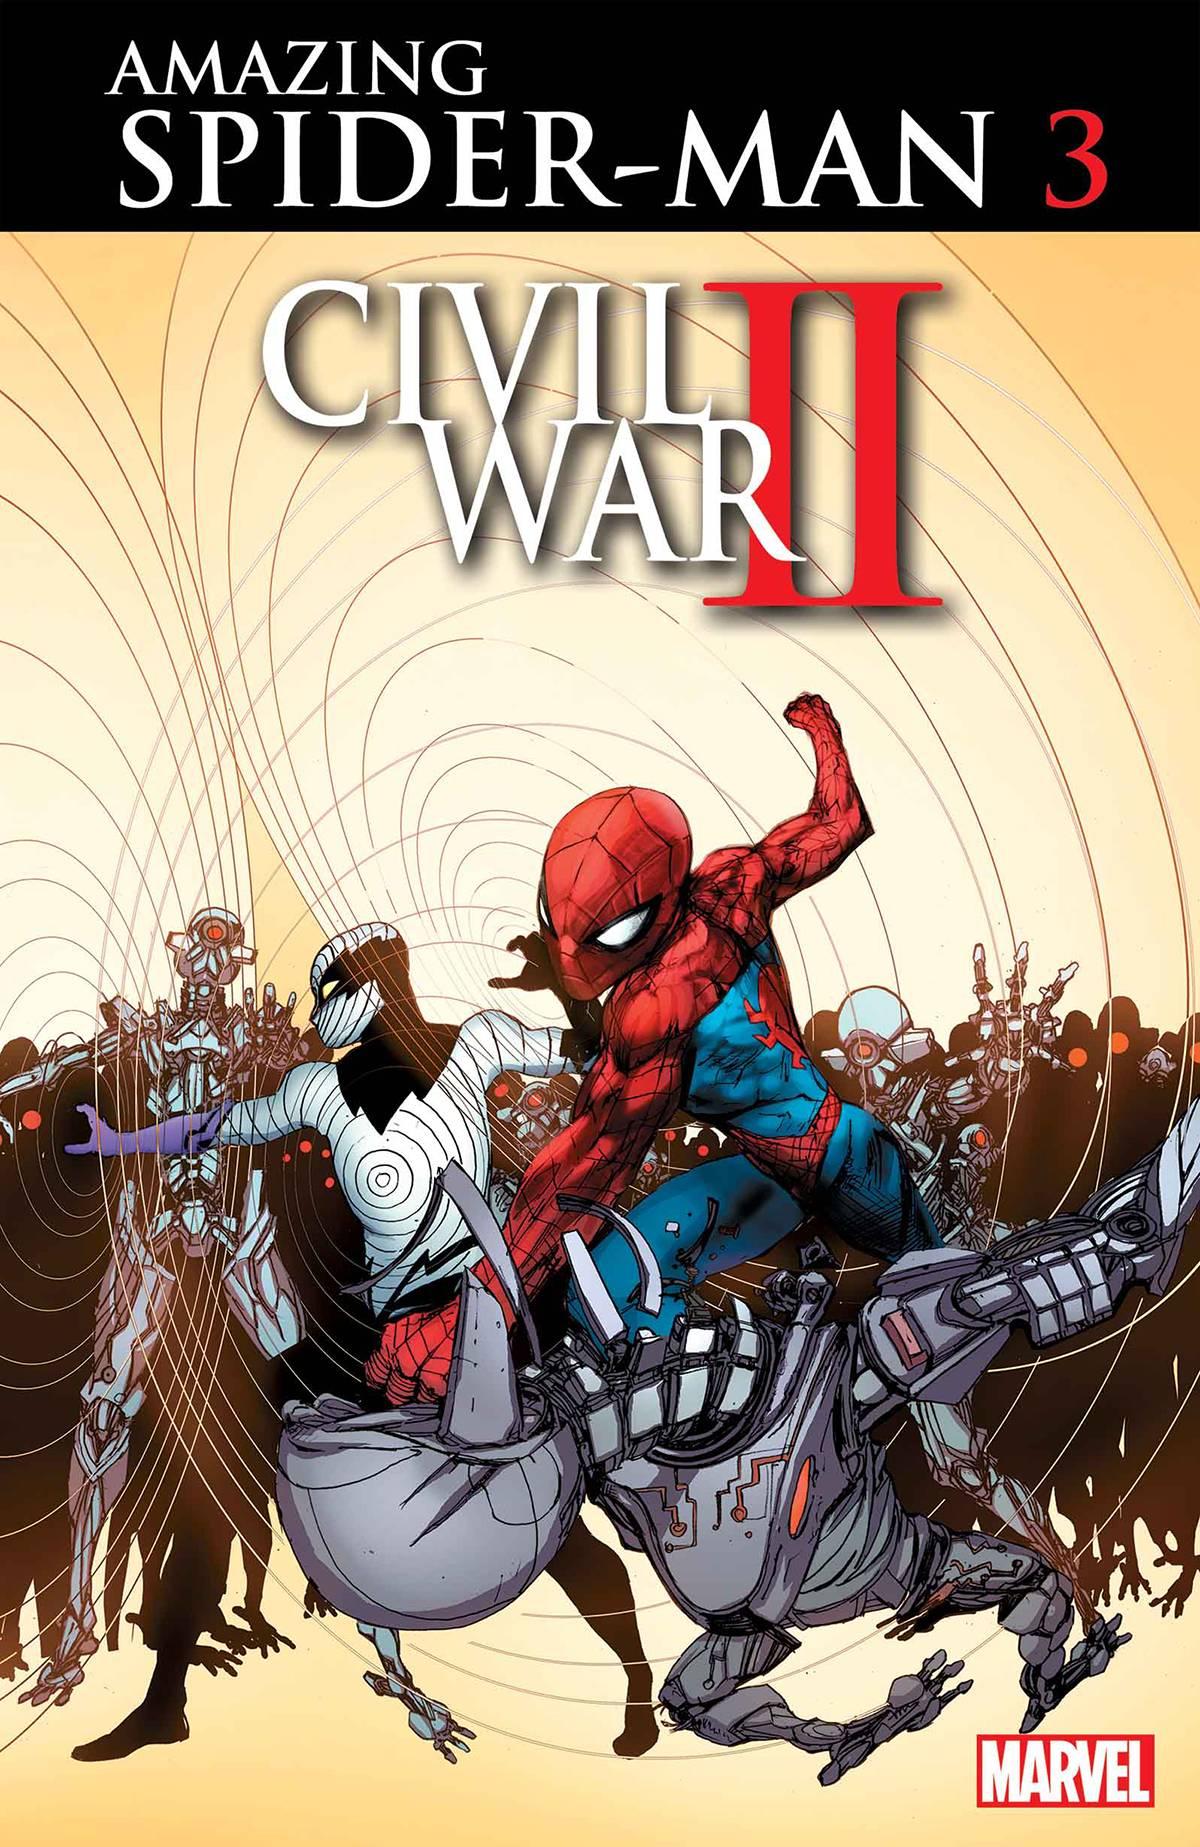 CIVIL WAR II AMAZING SPIDER-MAN #3 (OF 4)